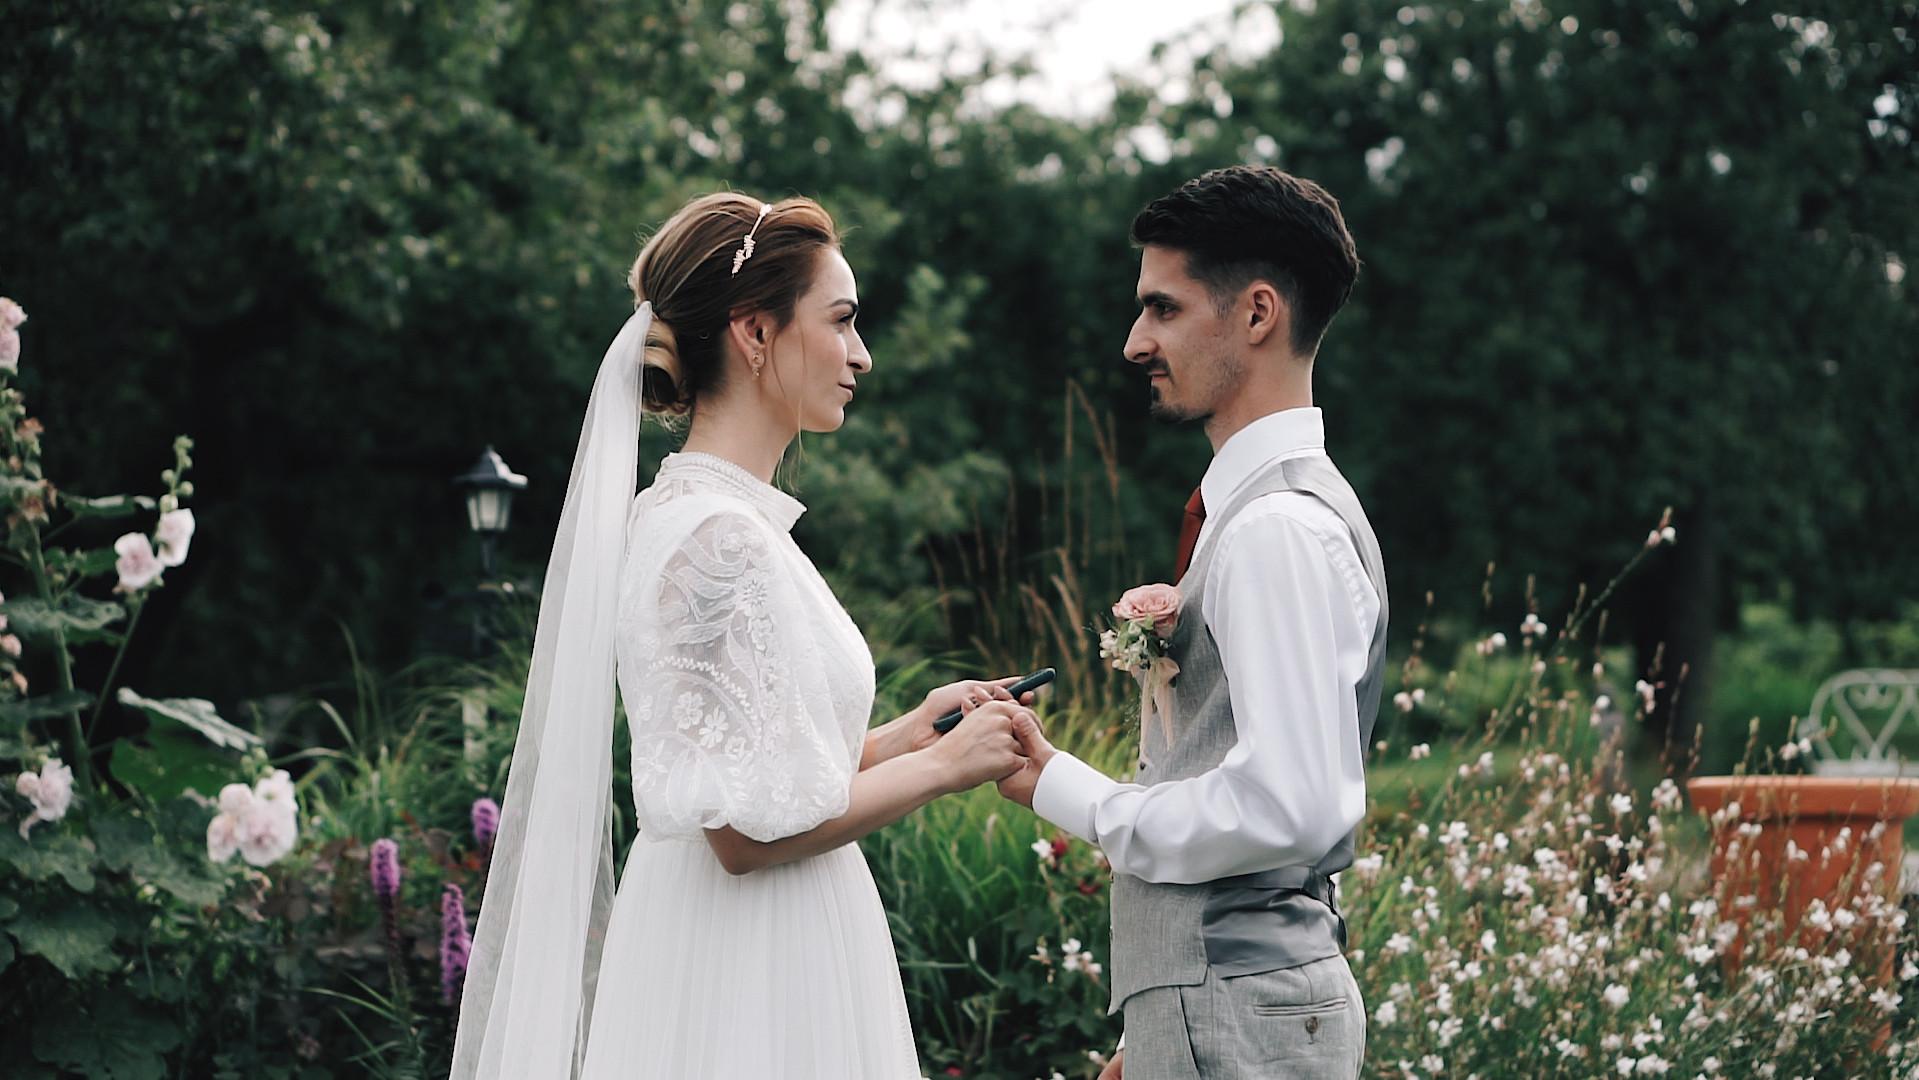 Katka & Lukaš